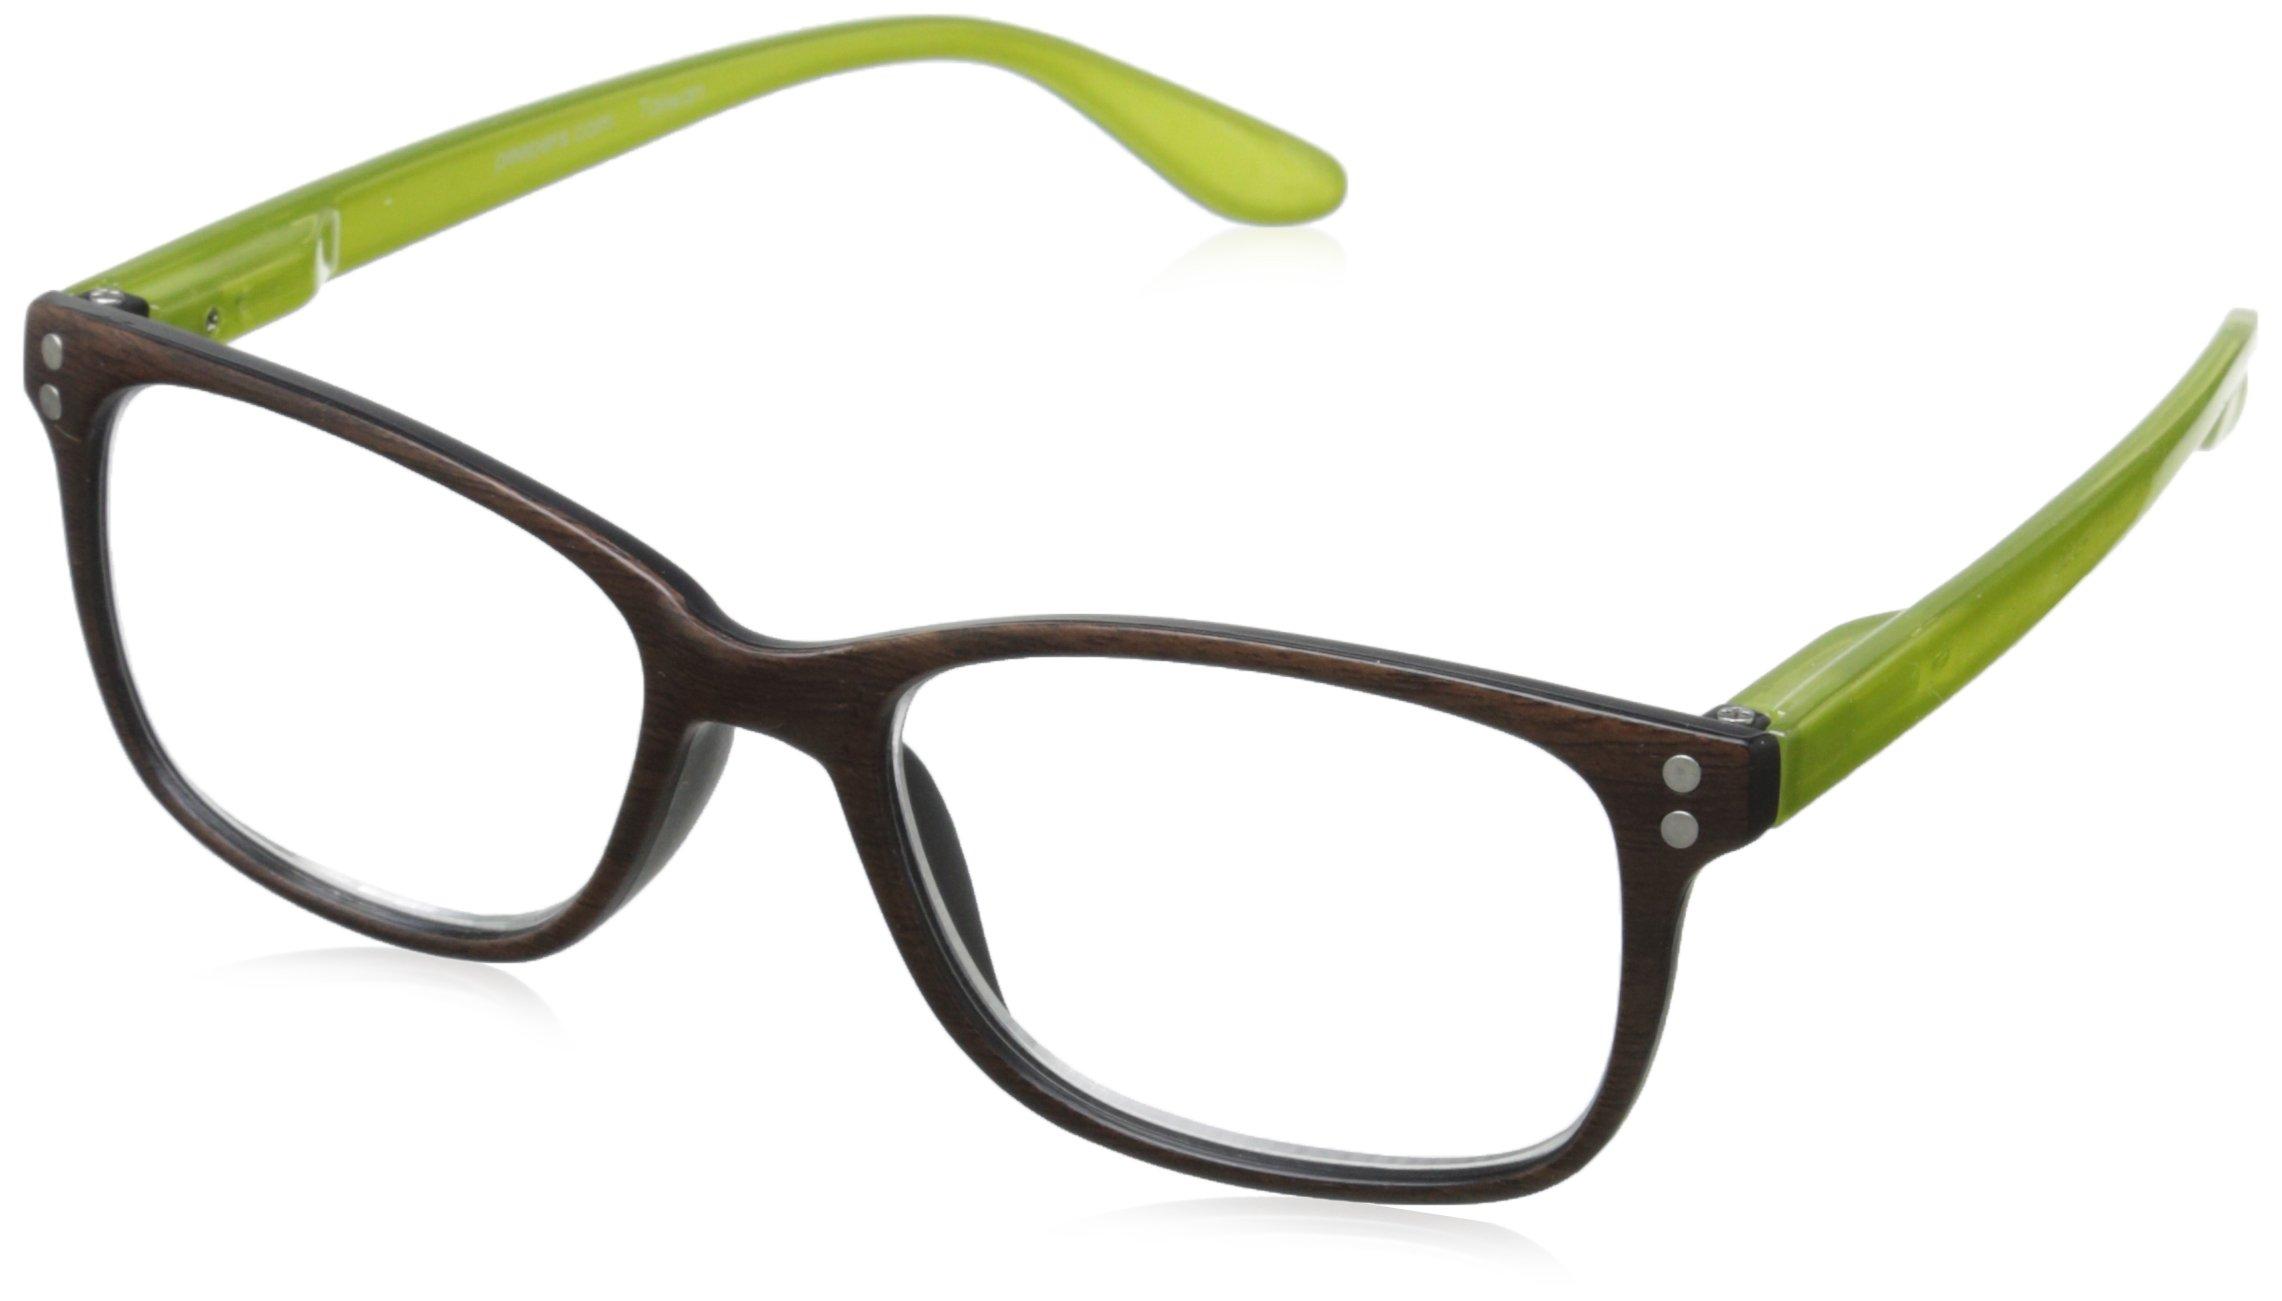 Peepers Wildwood Rectangular Reading Glasses, Brown & Green, 3.25